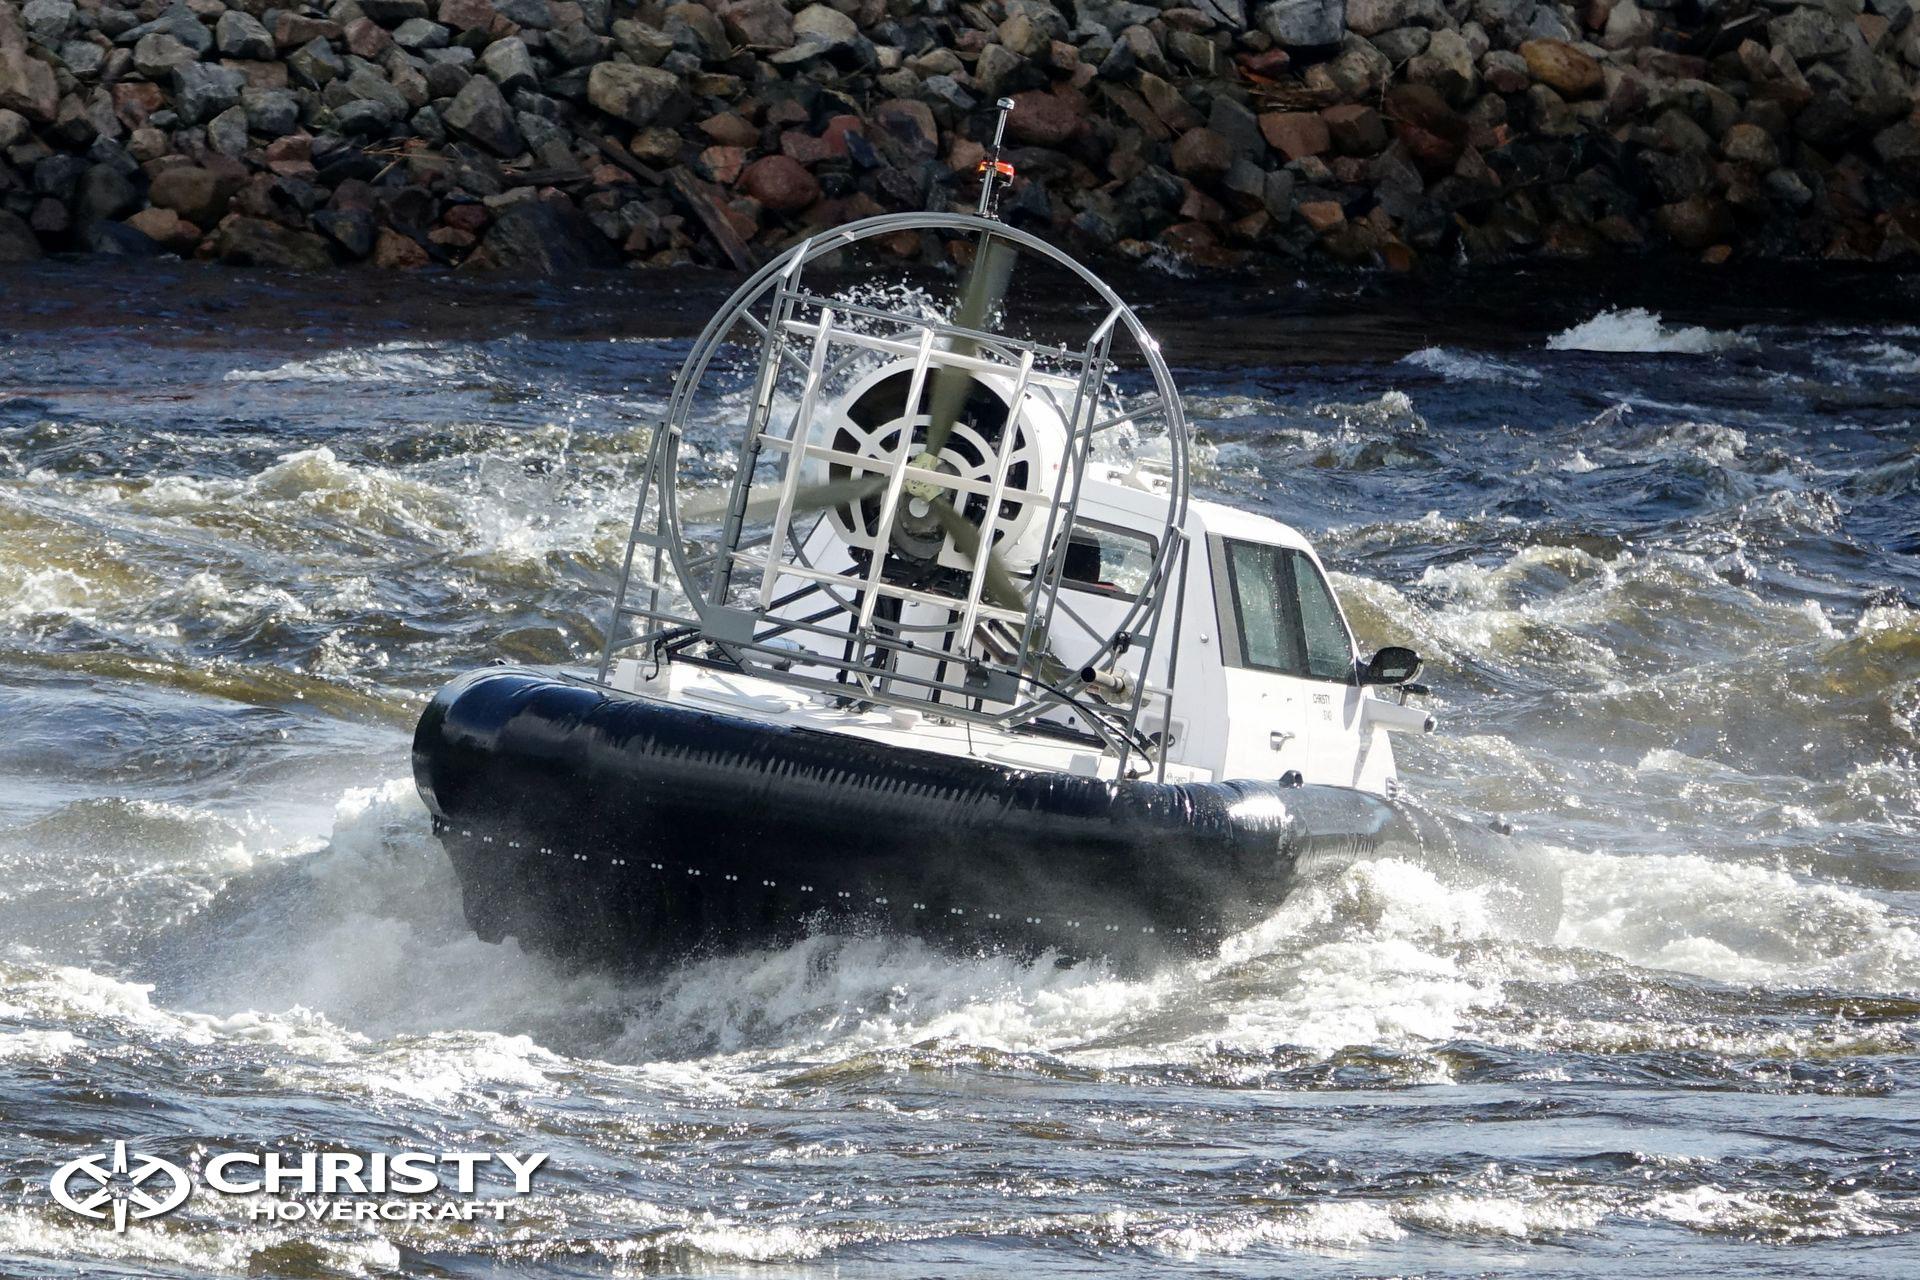 Hovercraft-Christy-5146-FC-17.jpg | фото №29